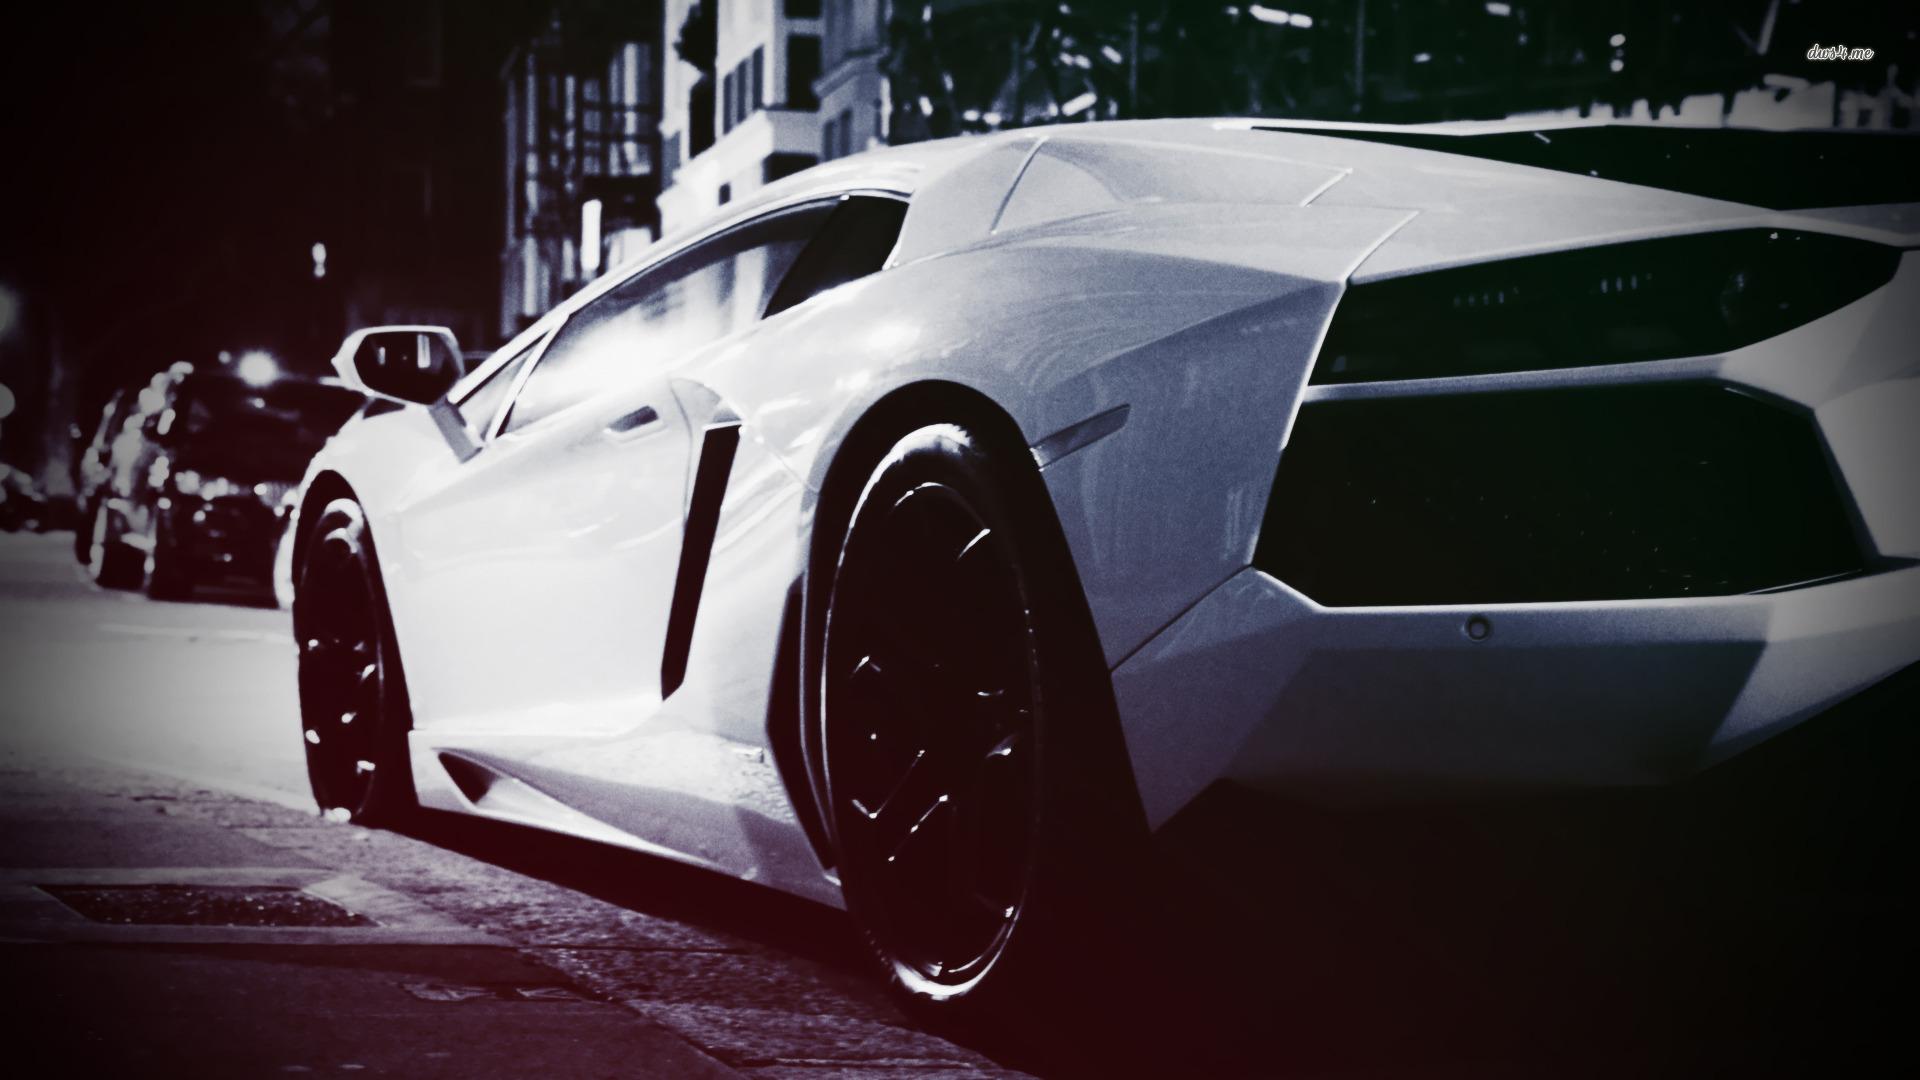 Lamborghini Wallpaper 1920x1080 Posted By Michelle Thompson